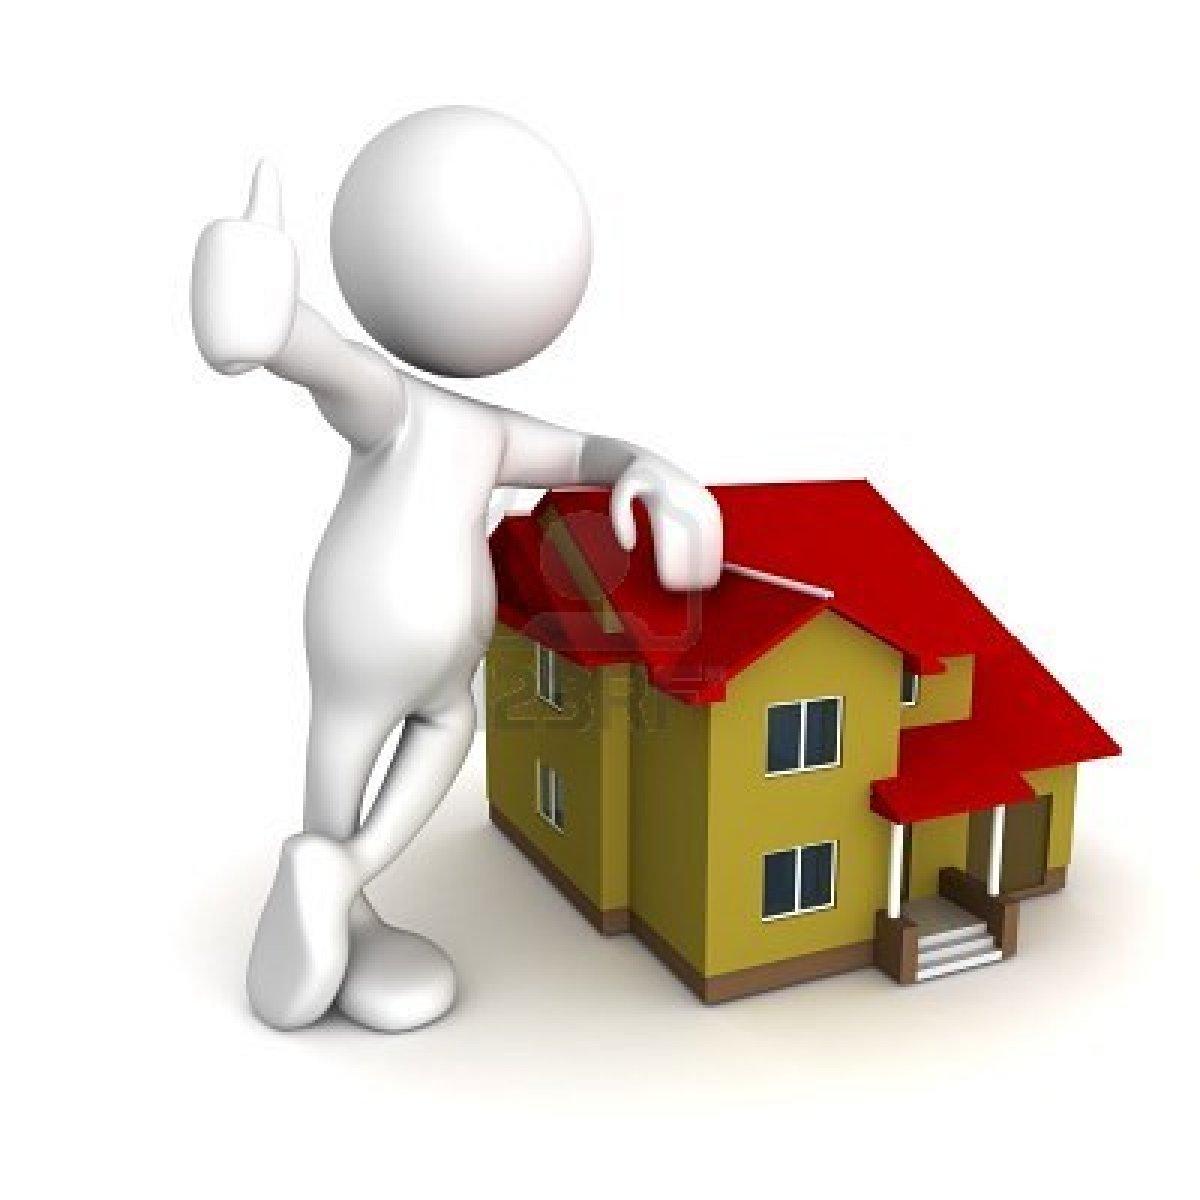 acheter sa maison stunning quelques piges viter avant dacheter sa maison with acheter sa maison. Black Bedroom Furniture Sets. Home Design Ideas